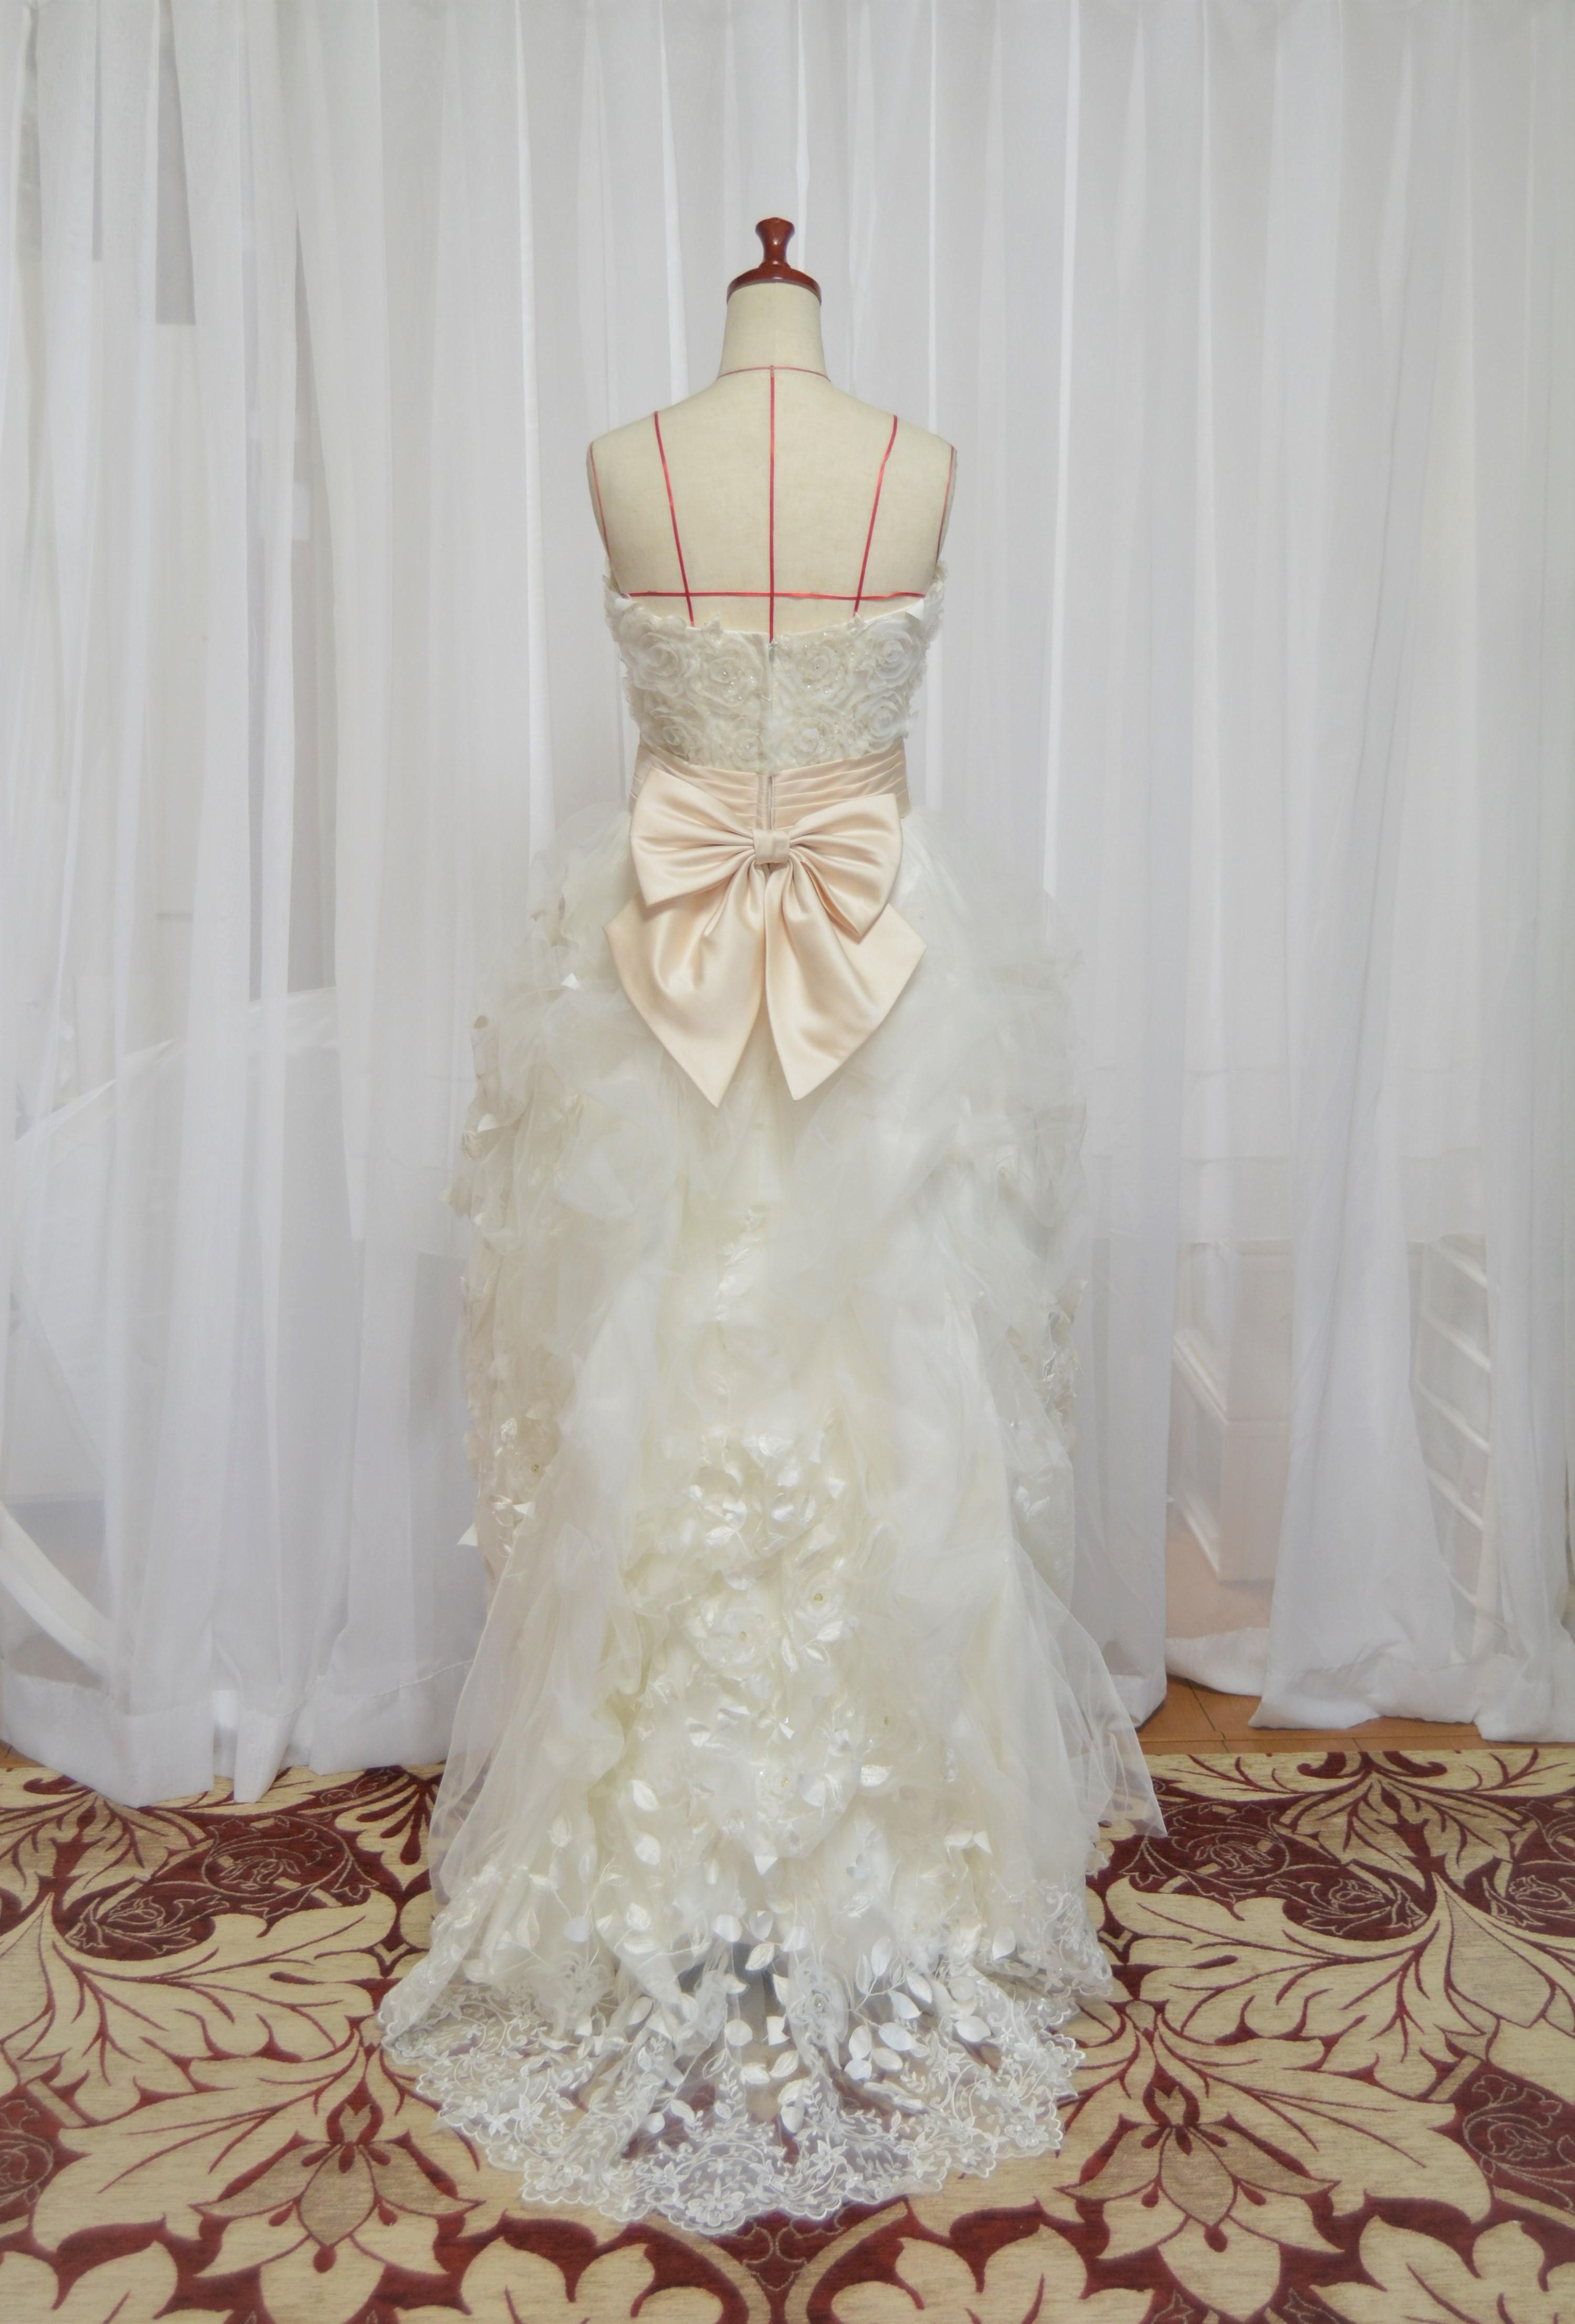 hanayomesalon  ミニ トレーン ウエディングドレス